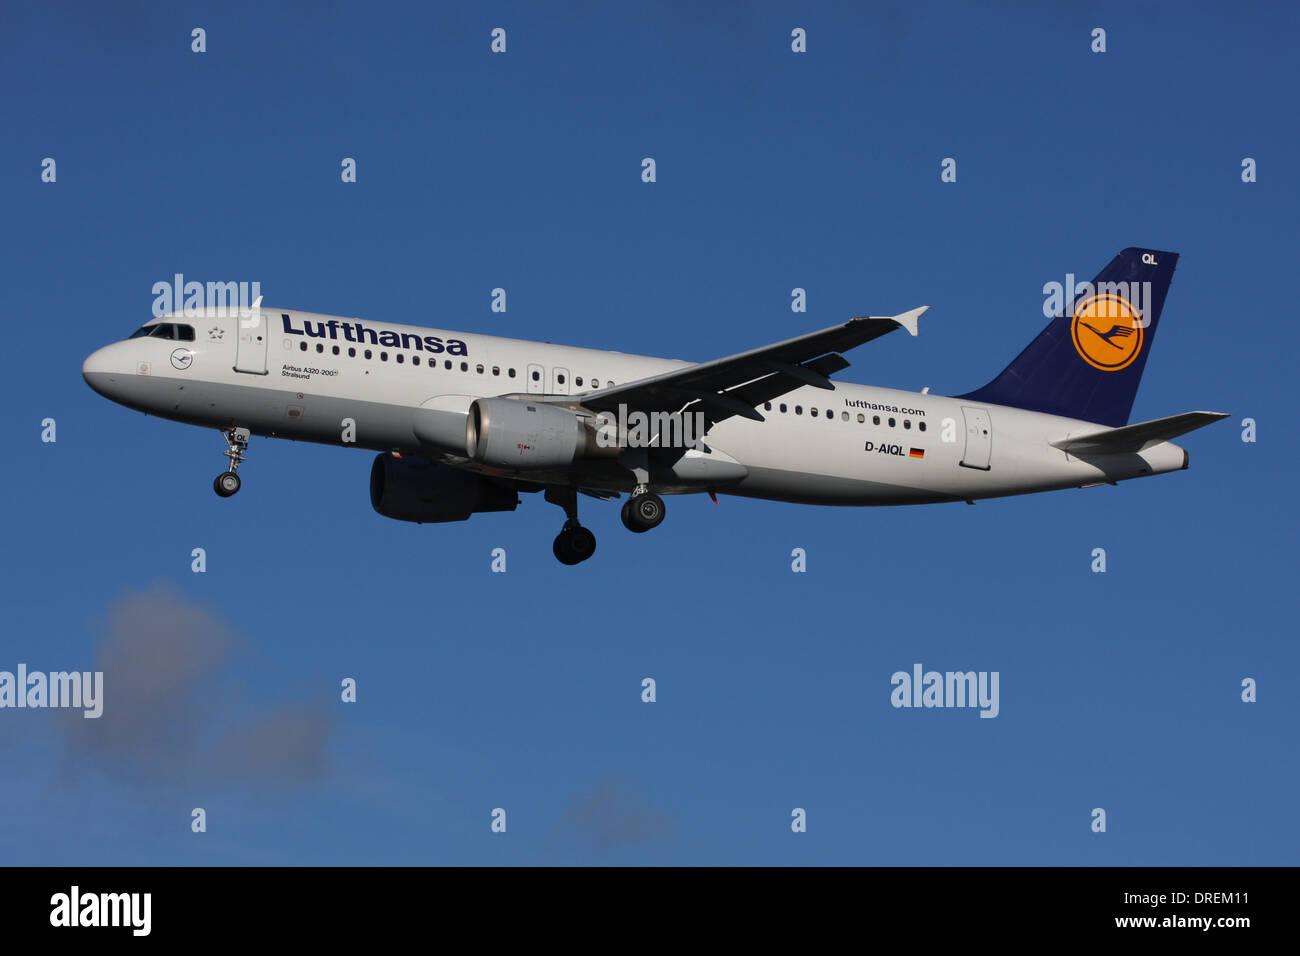 LUFTHANSA AIRBUS A320 - Stock Image